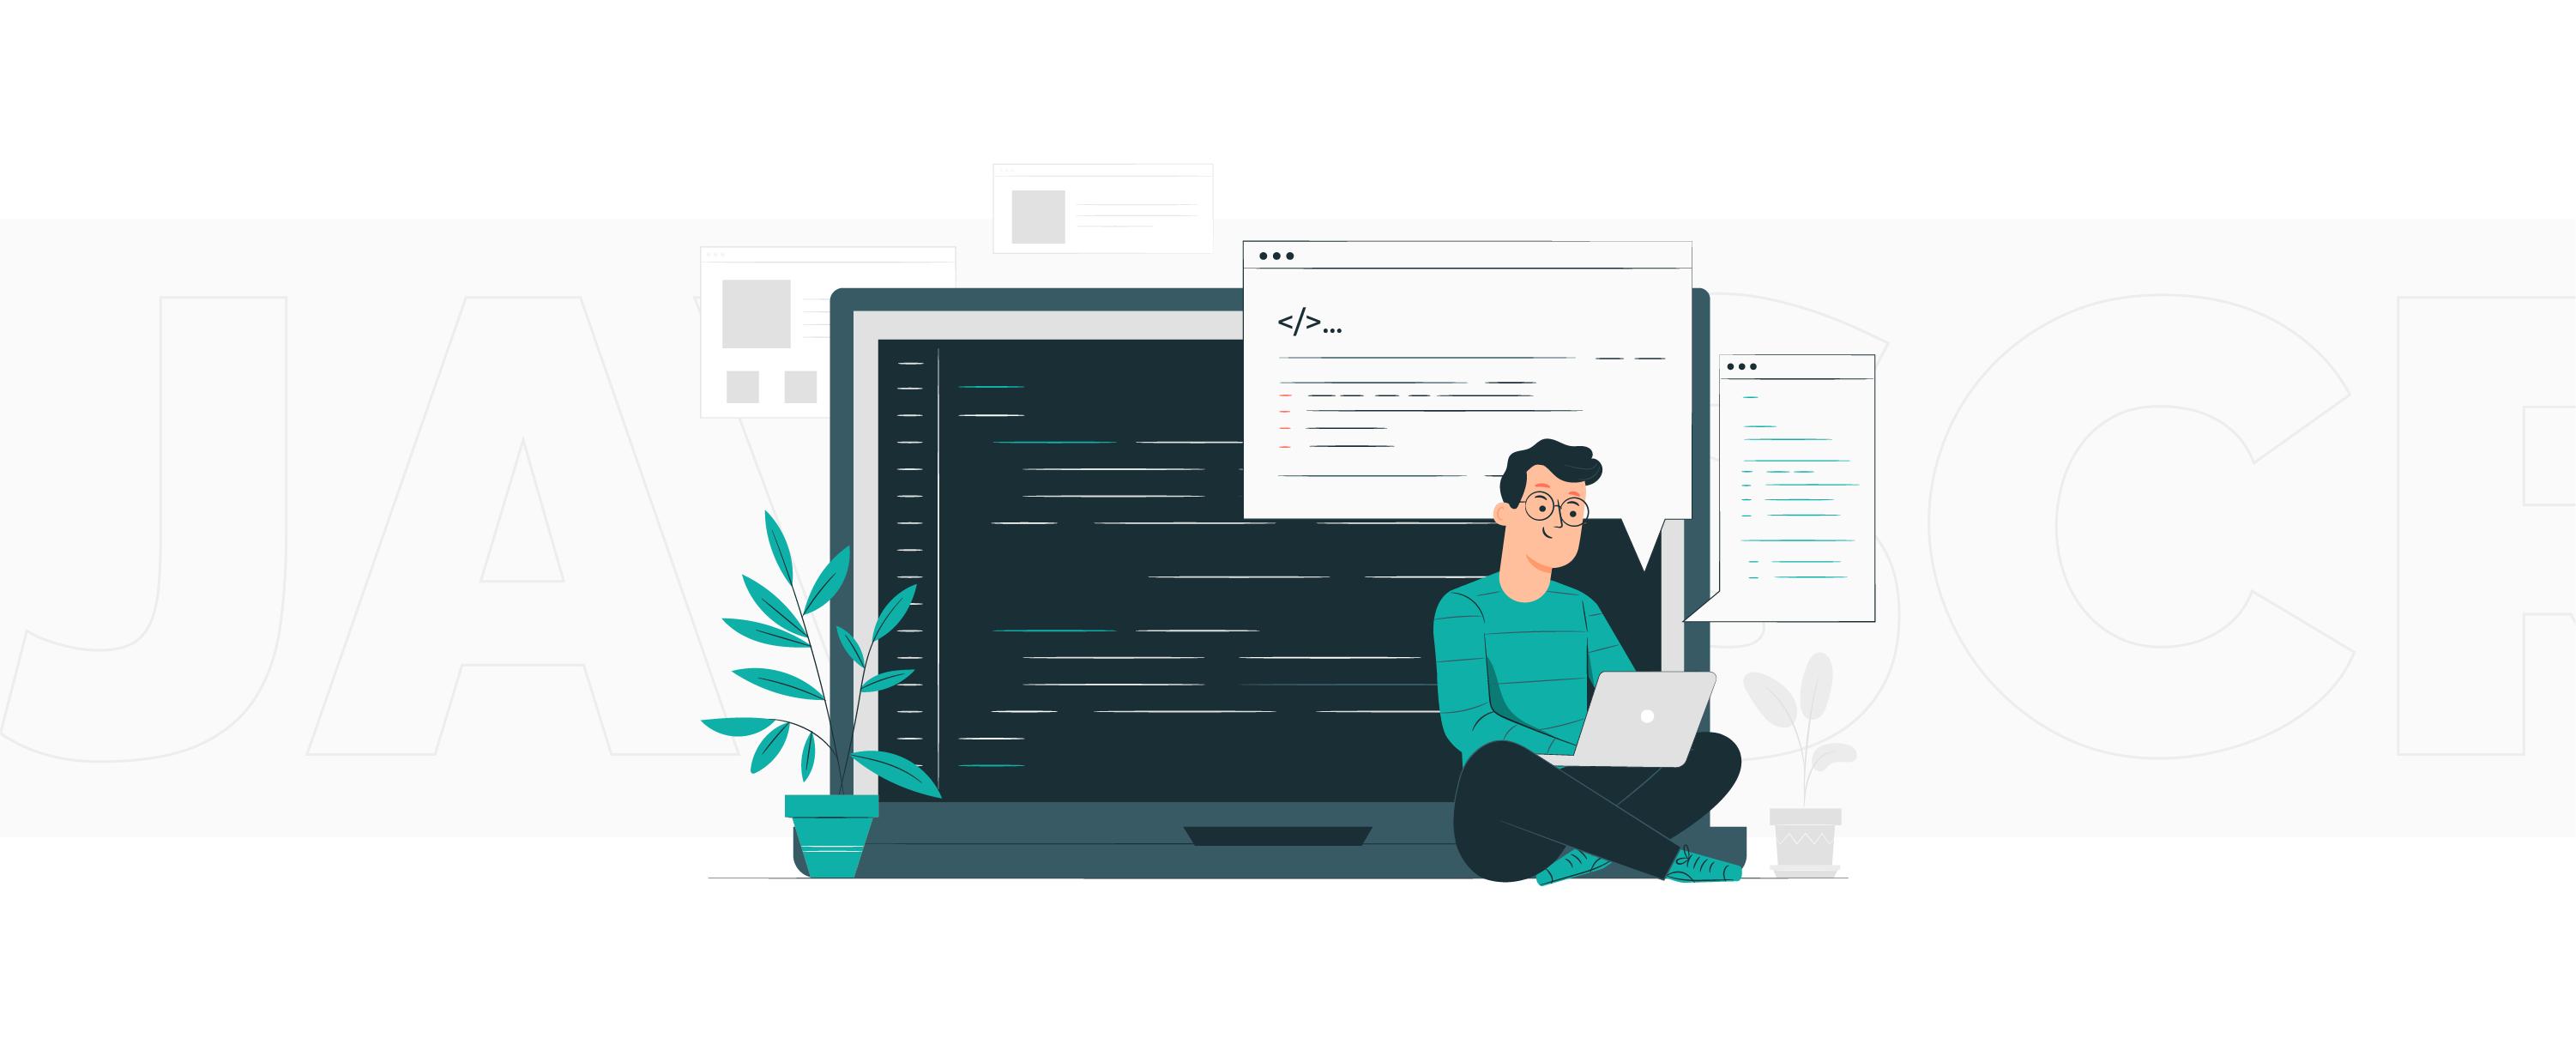 Why do startups choose JavaScript?   TechMagic.co